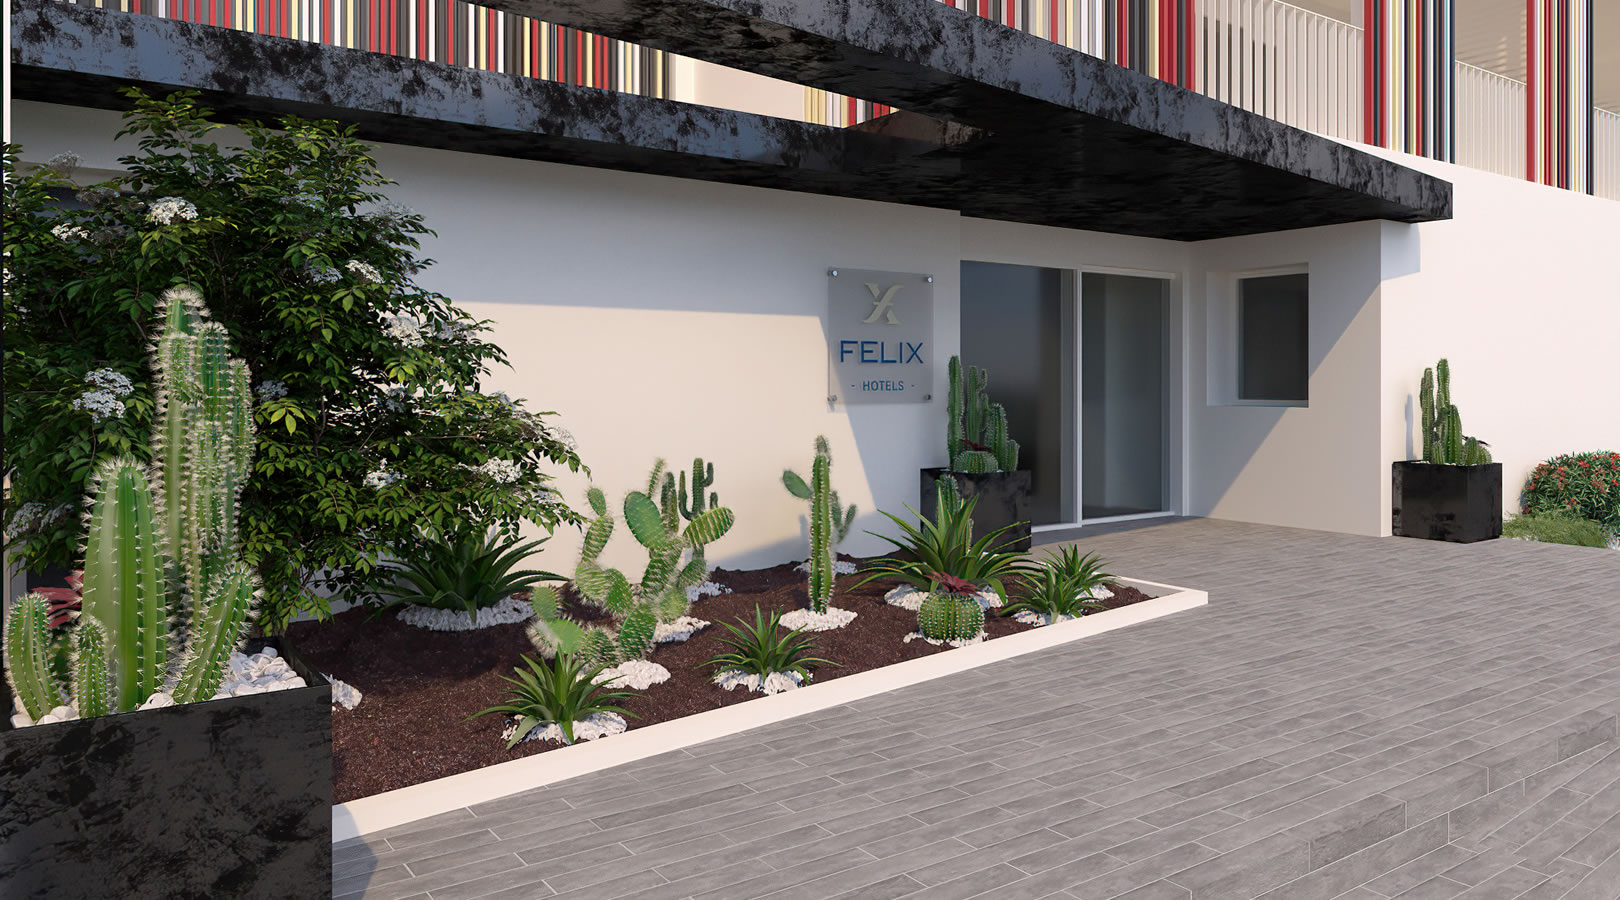 gruppo-felix-hotels-felix-olbia-sardegba13